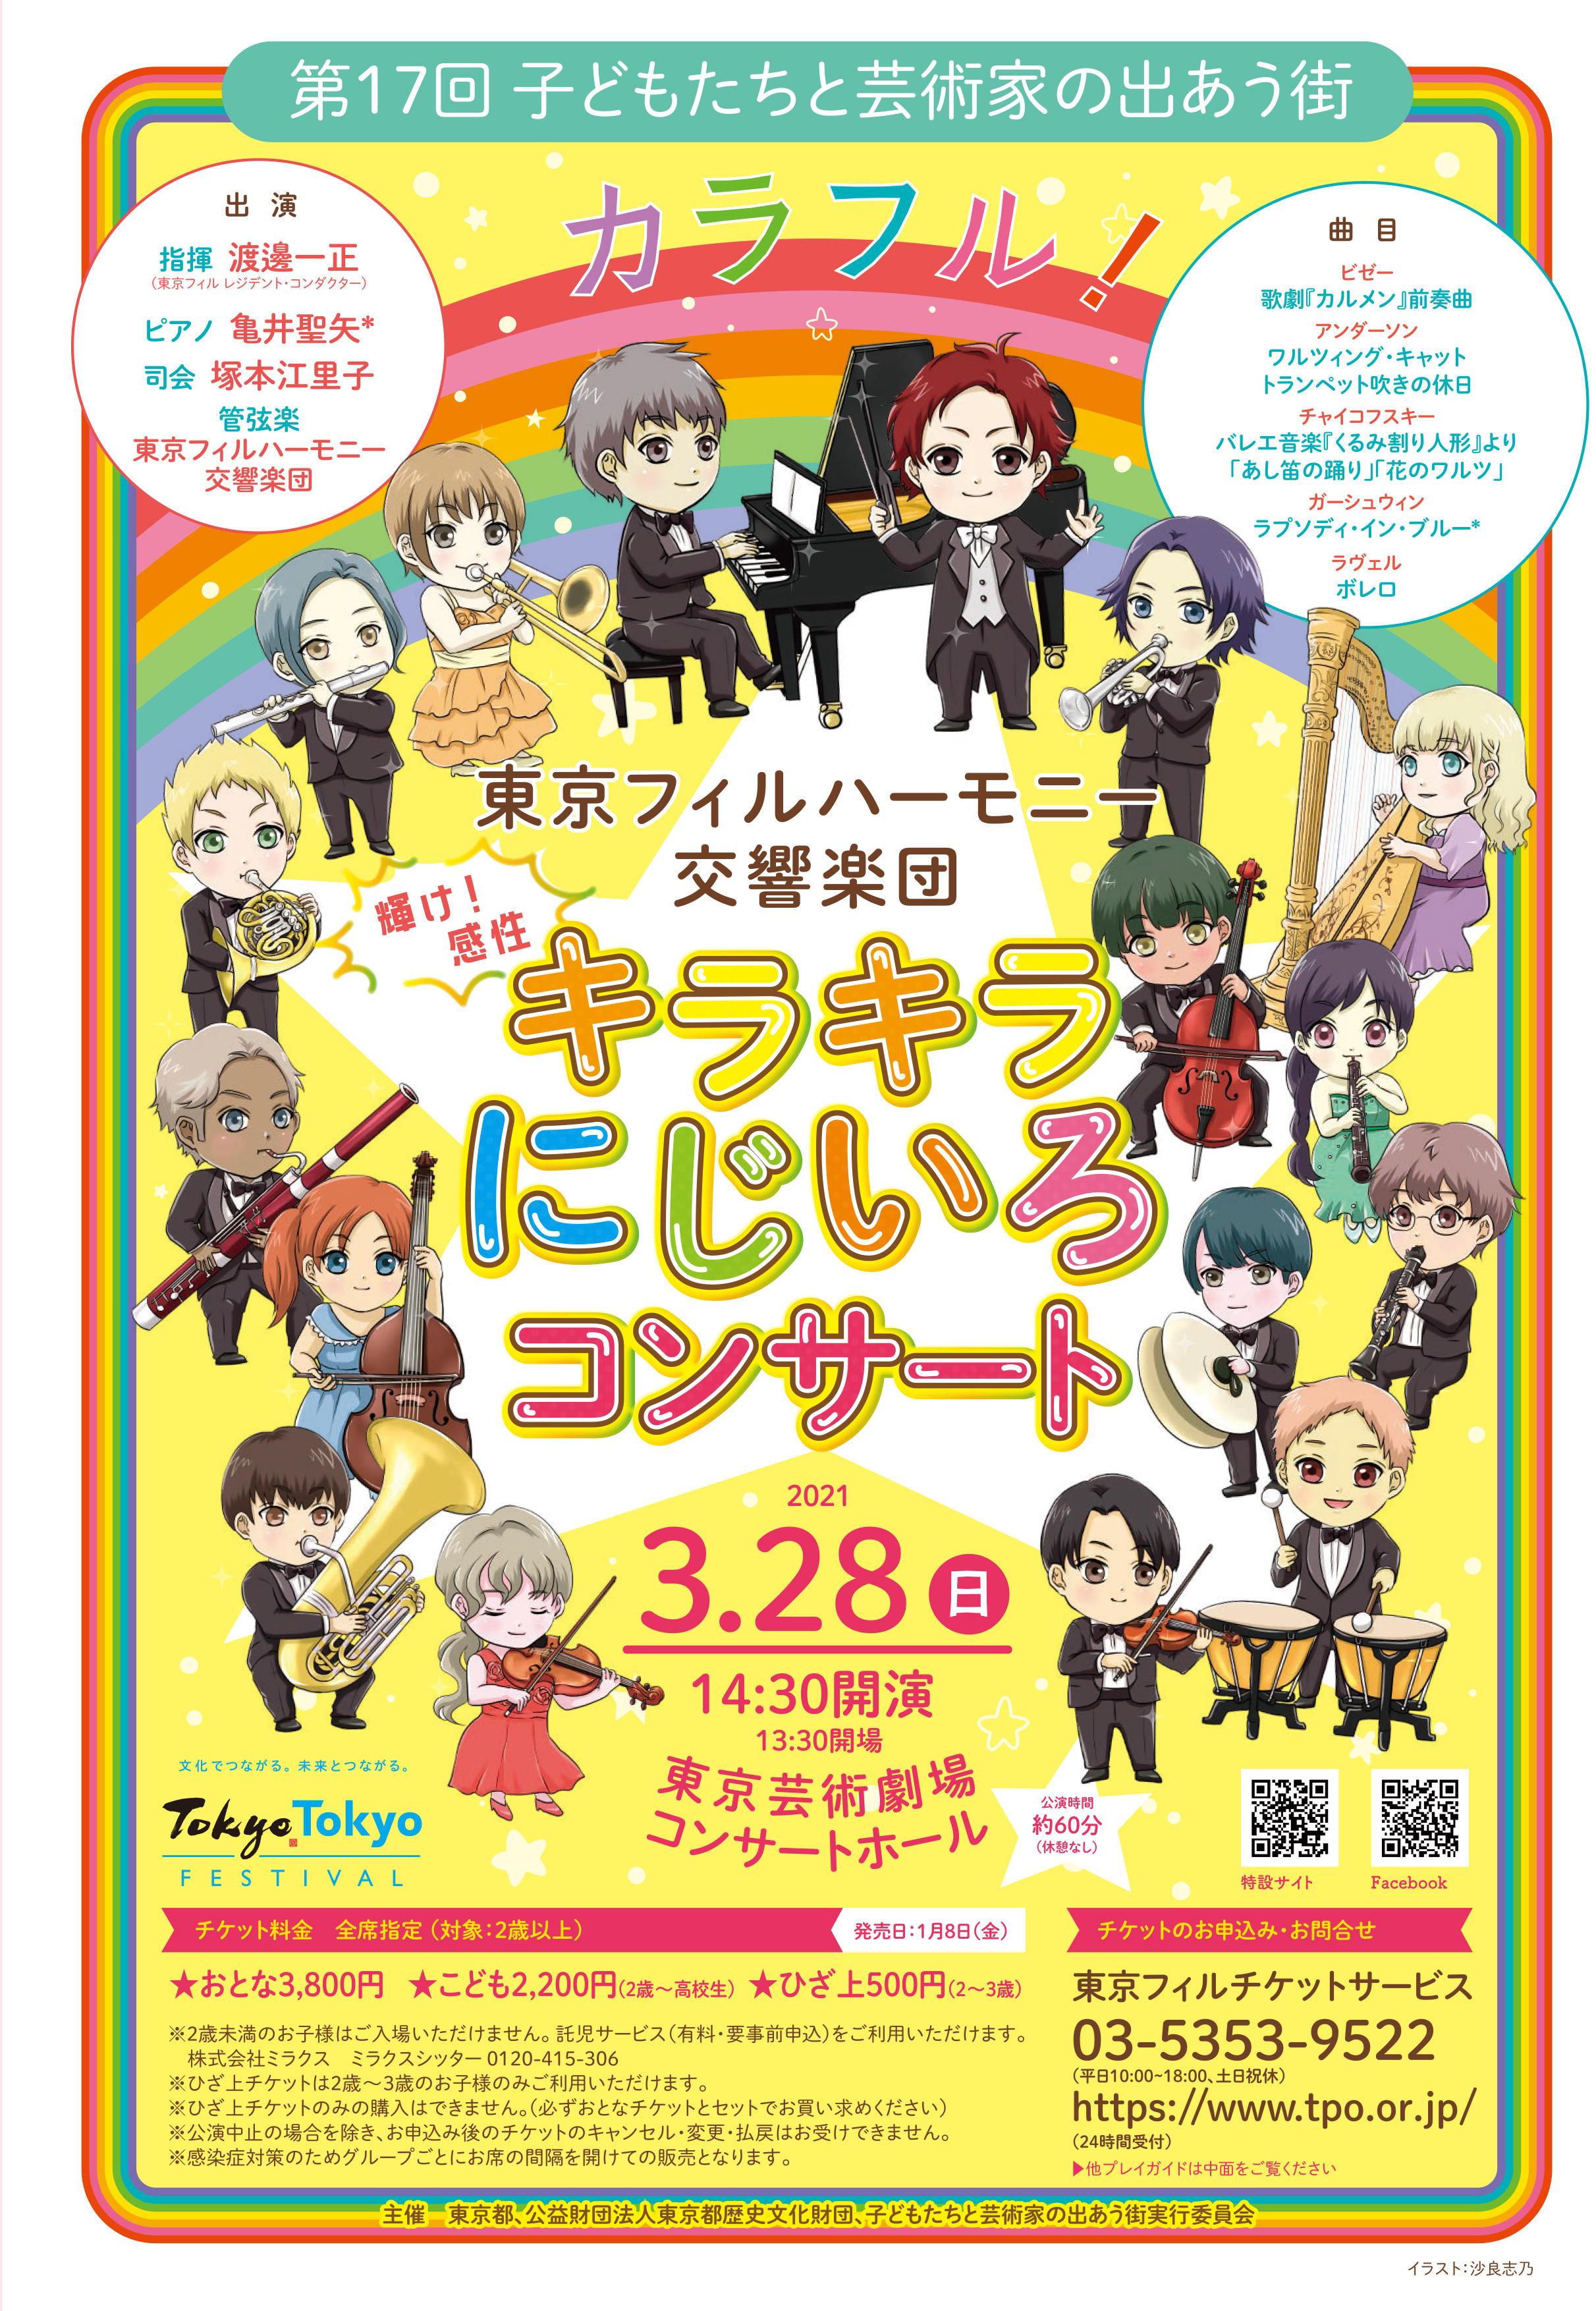 https://www.orchestra.or.jp/information/uploads/caf8fdc9efc873f2ab4e1e54ae1aa346c1cdcf3c.jpg